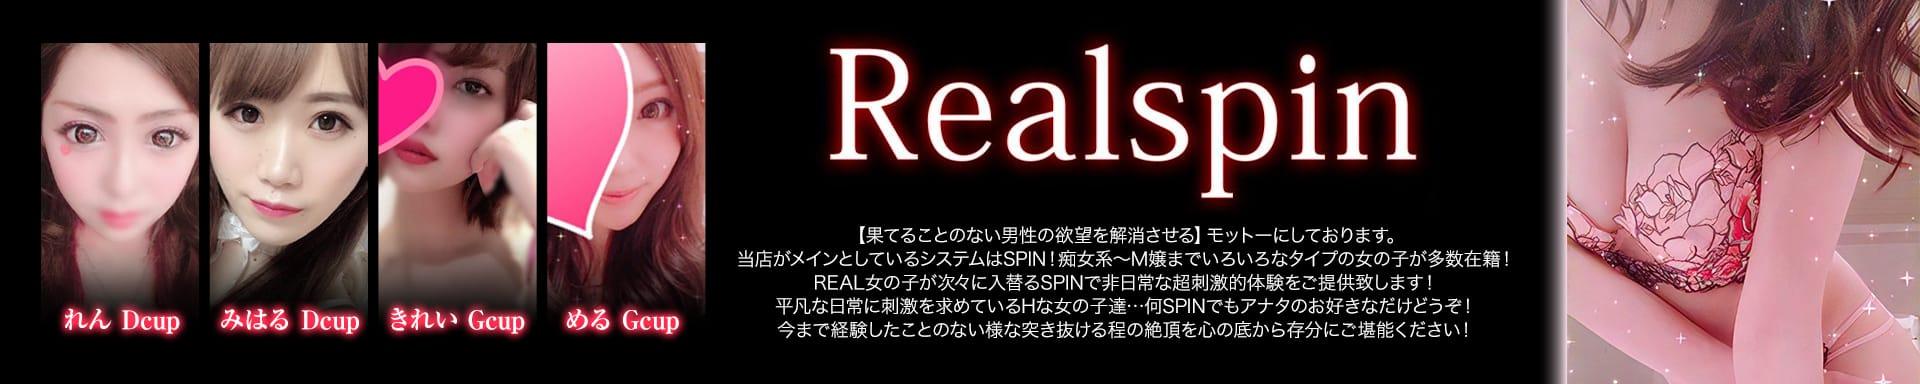 Realspin その3